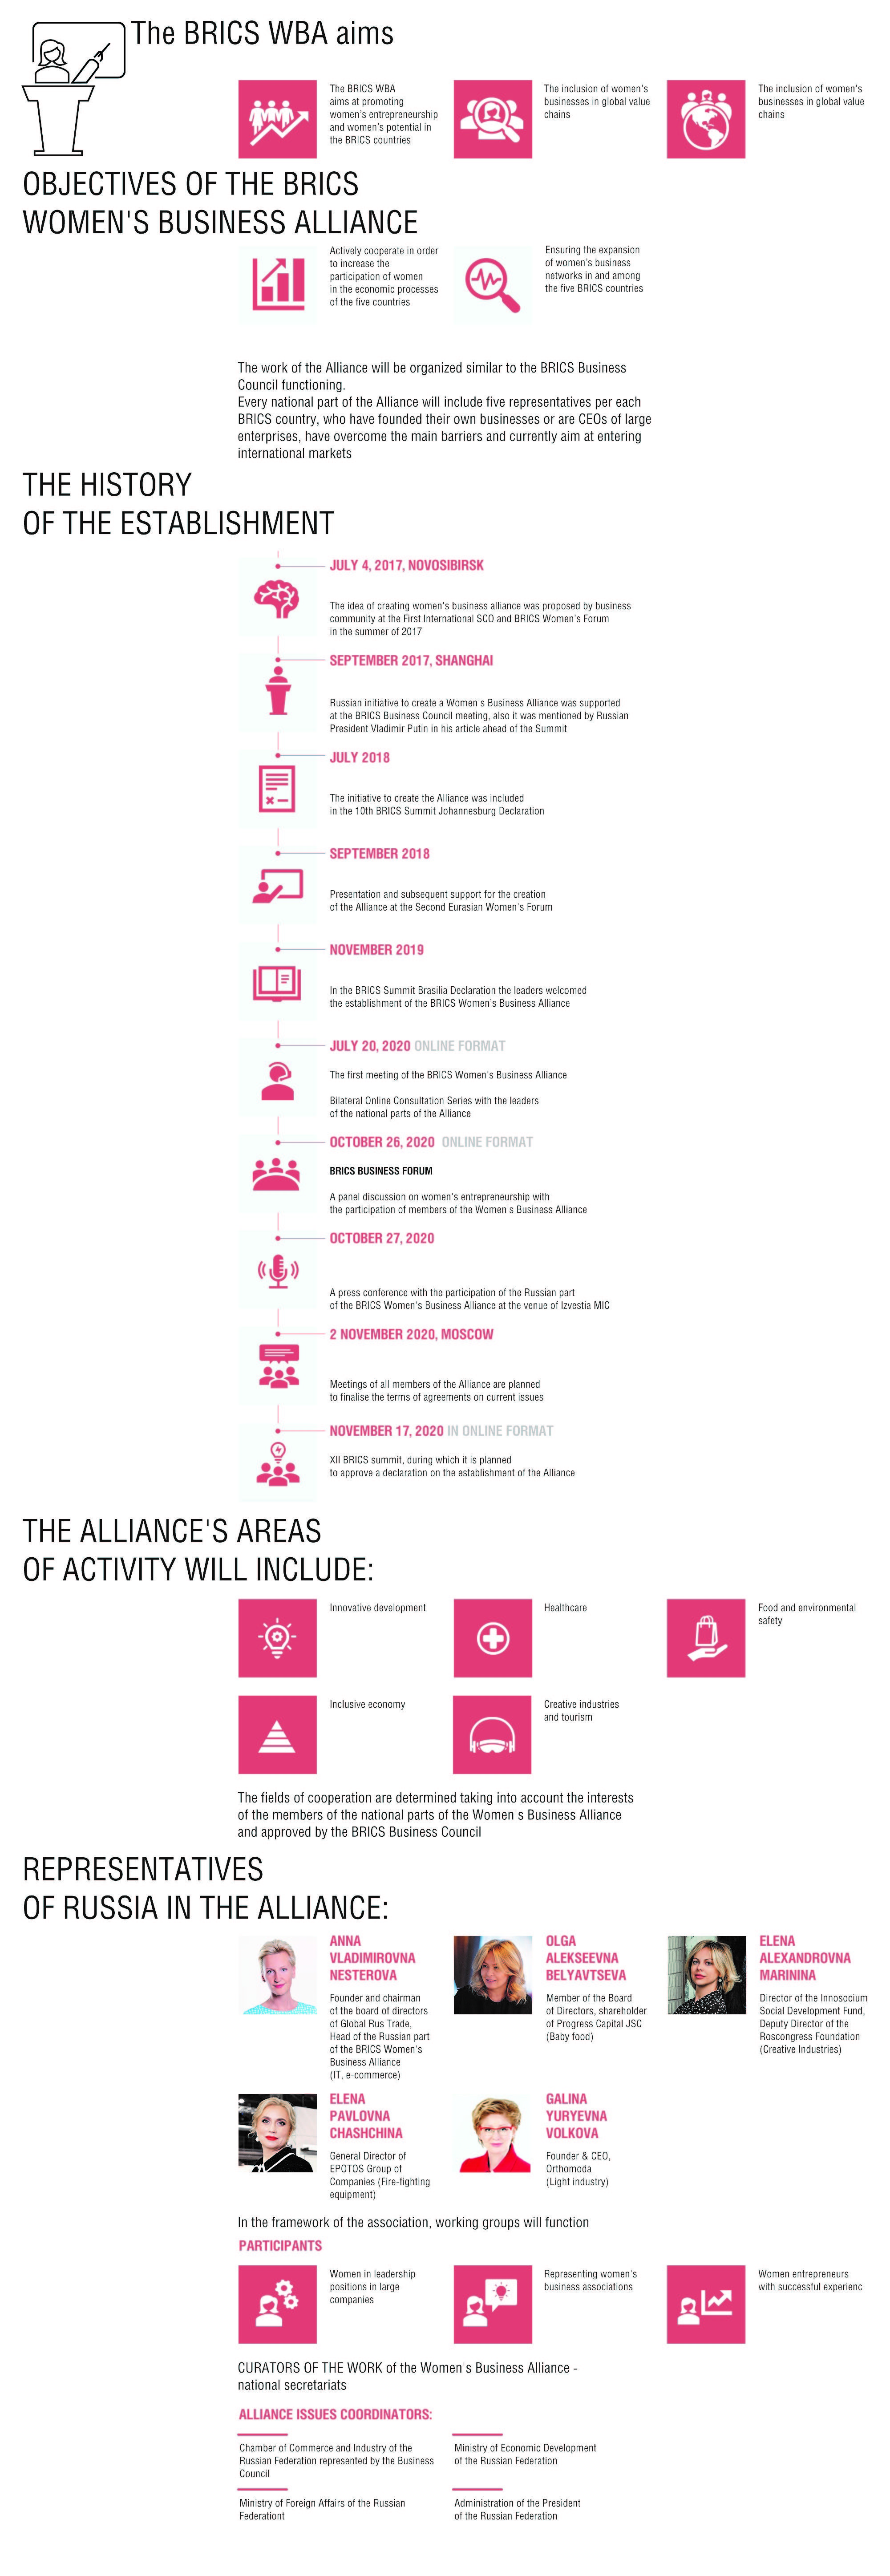 BRICS Women's Business Alliance